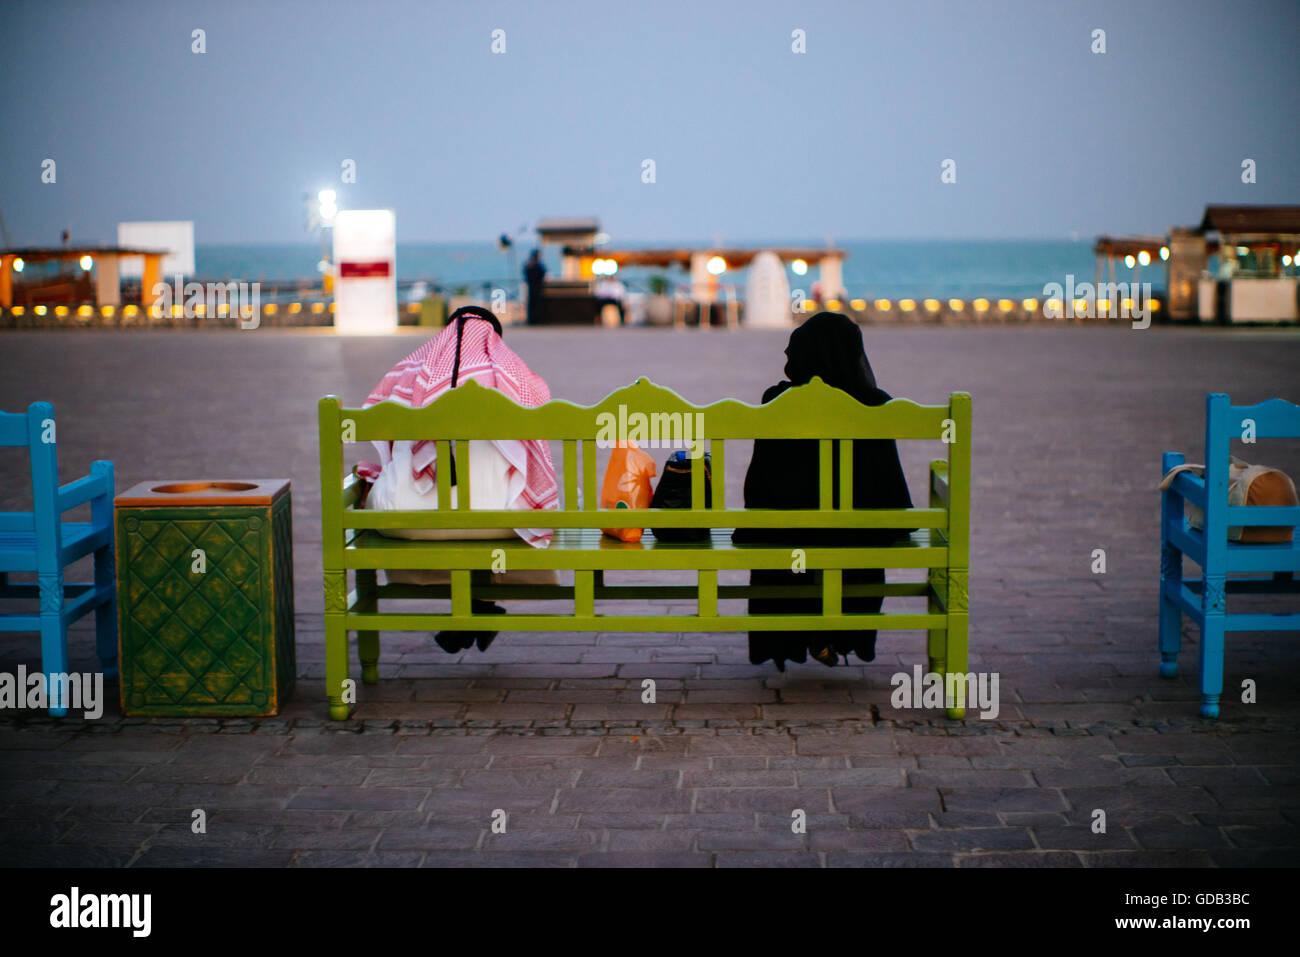 Qataris  take a break at Katara cultural village, Doha, Qatar. - Stock Image